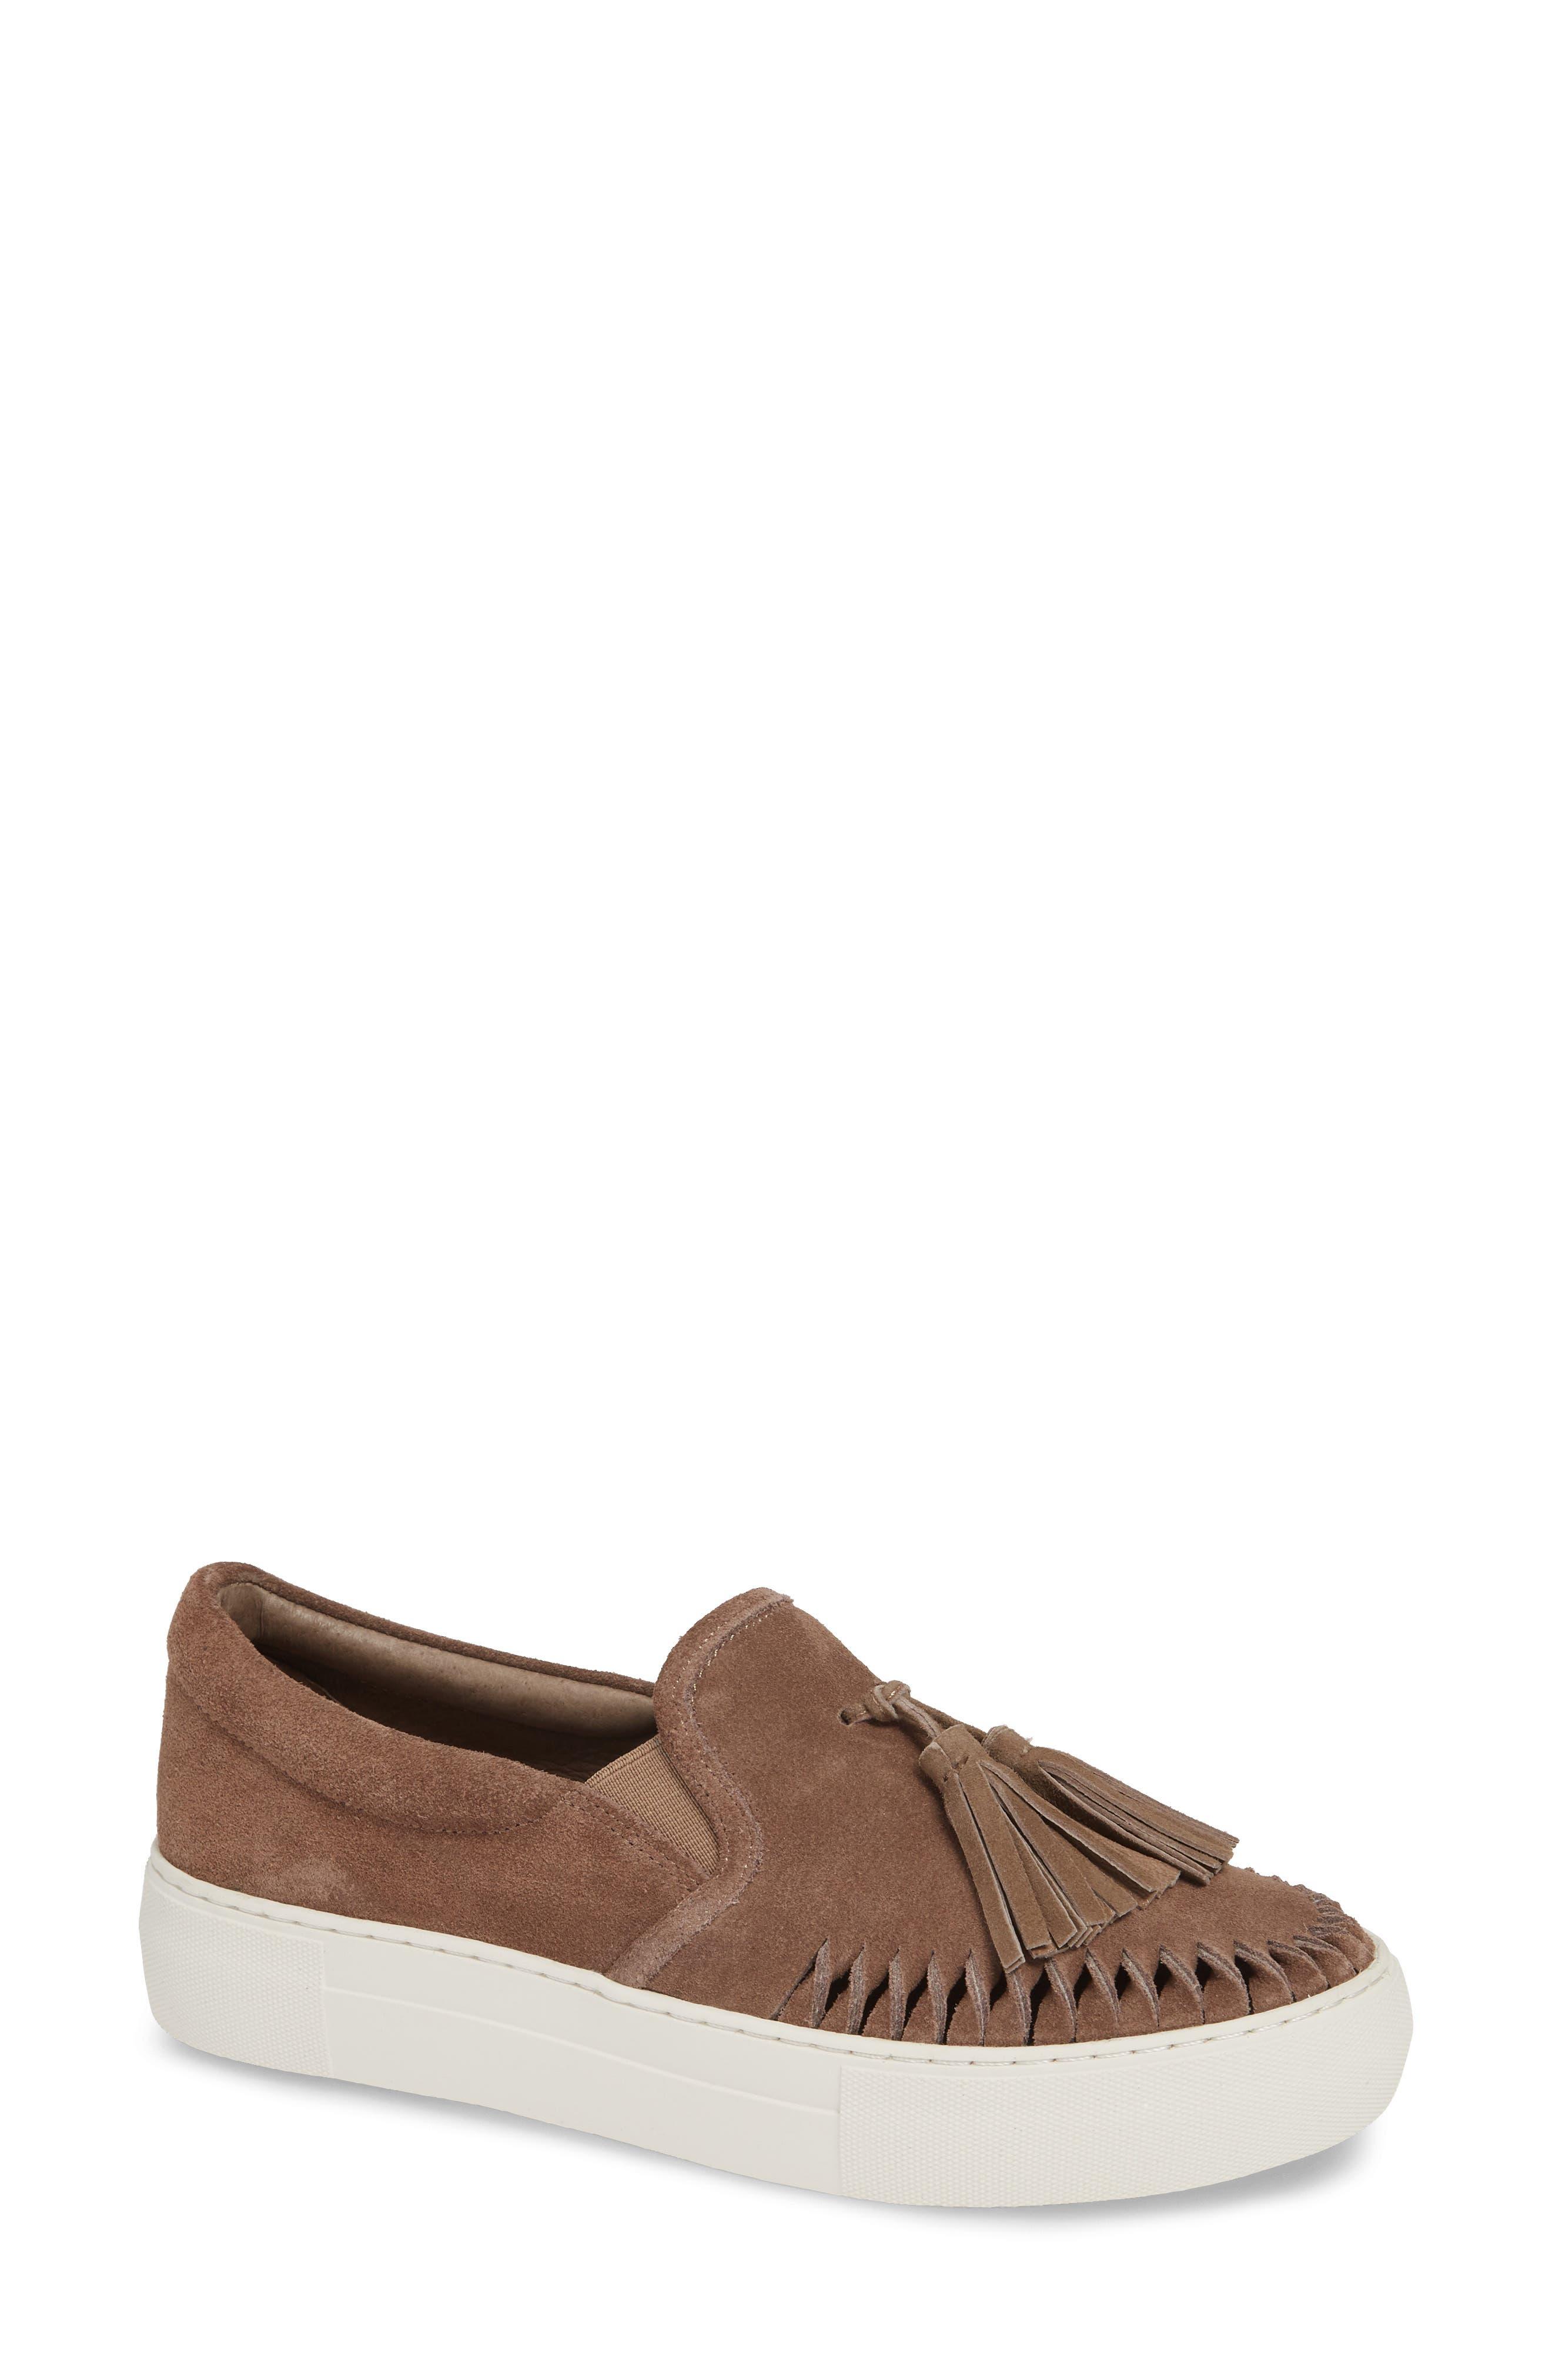 Tassel Slip-On Sneaker, Main, color, BEIGE